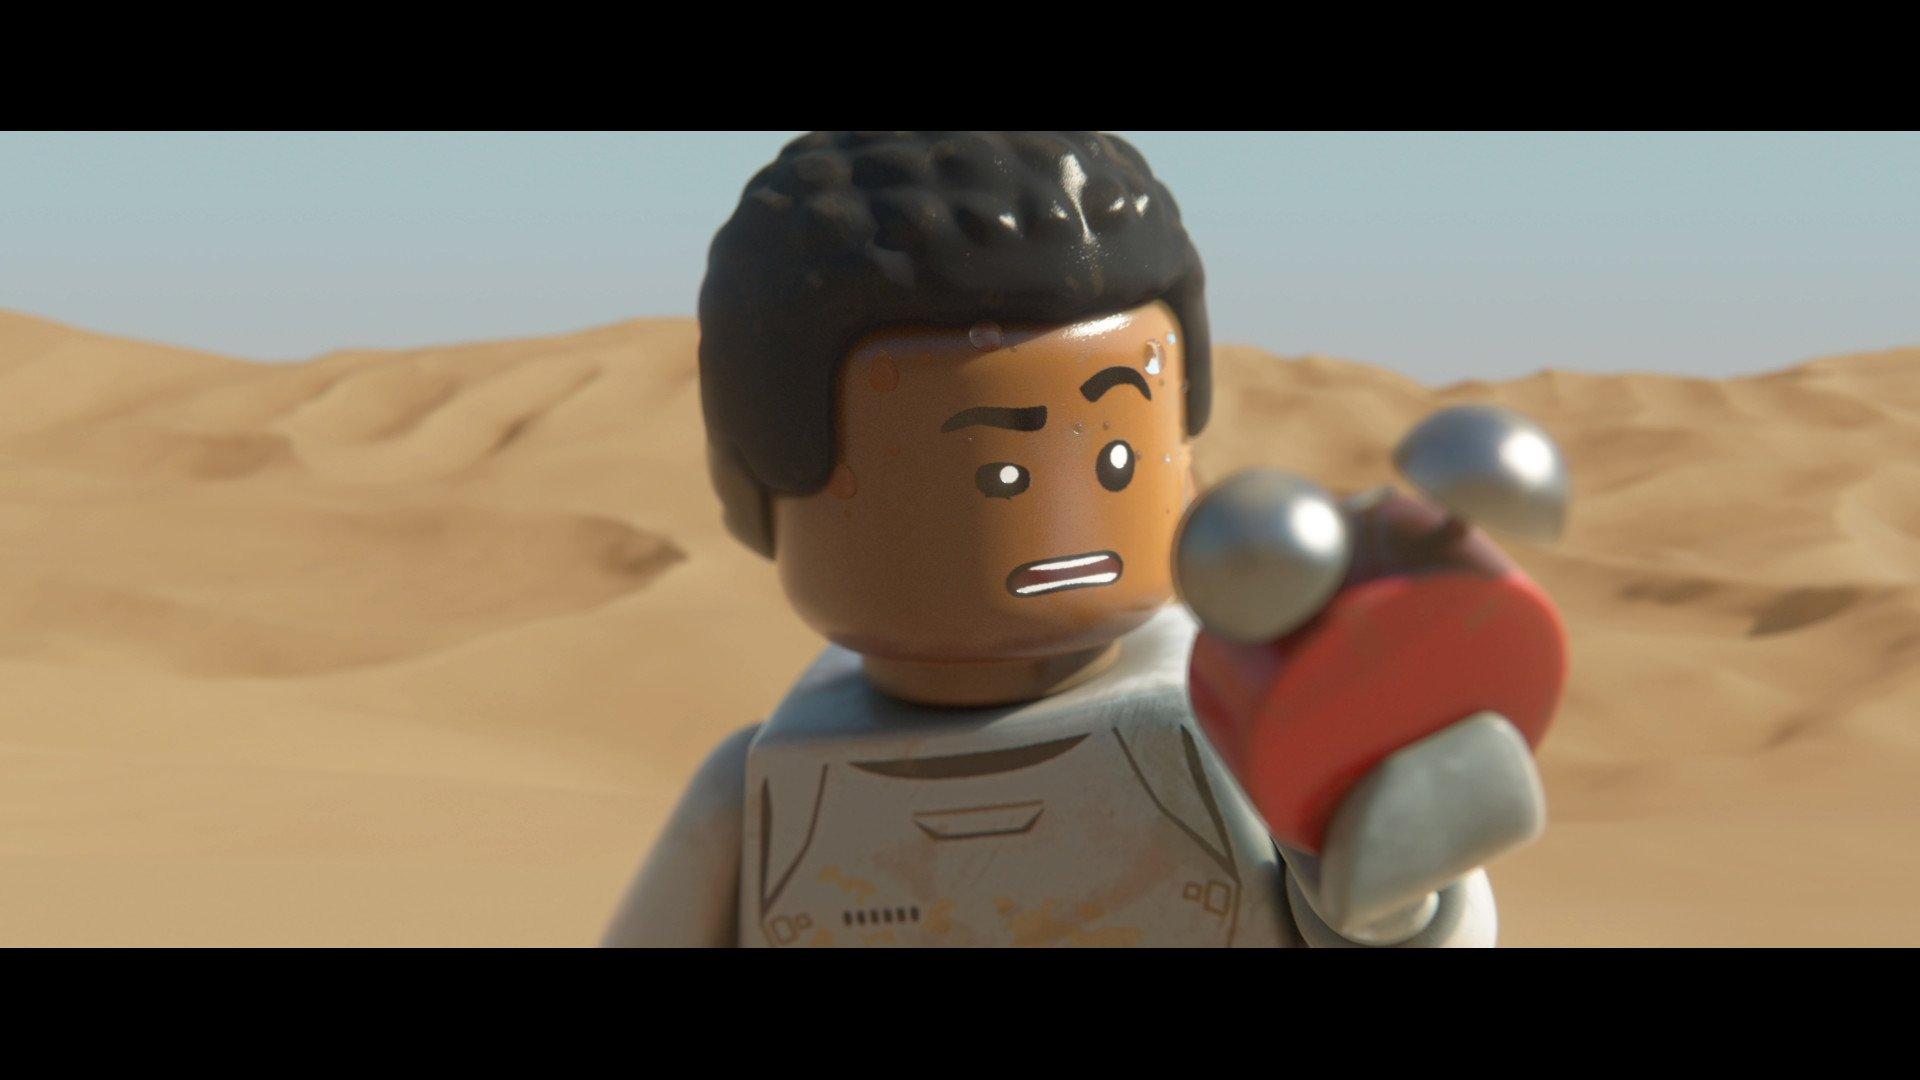 LEGO Star Wars The Force Awakens 9